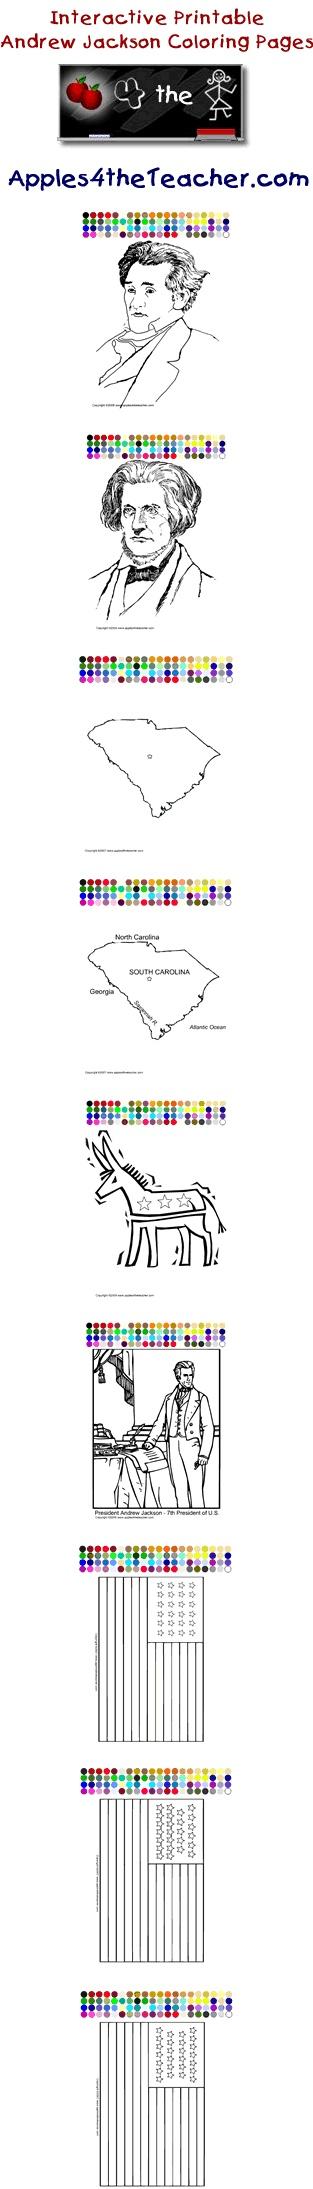 apples4theteacher com coloring pages - 1000 images about 6 patriotic coloring pages